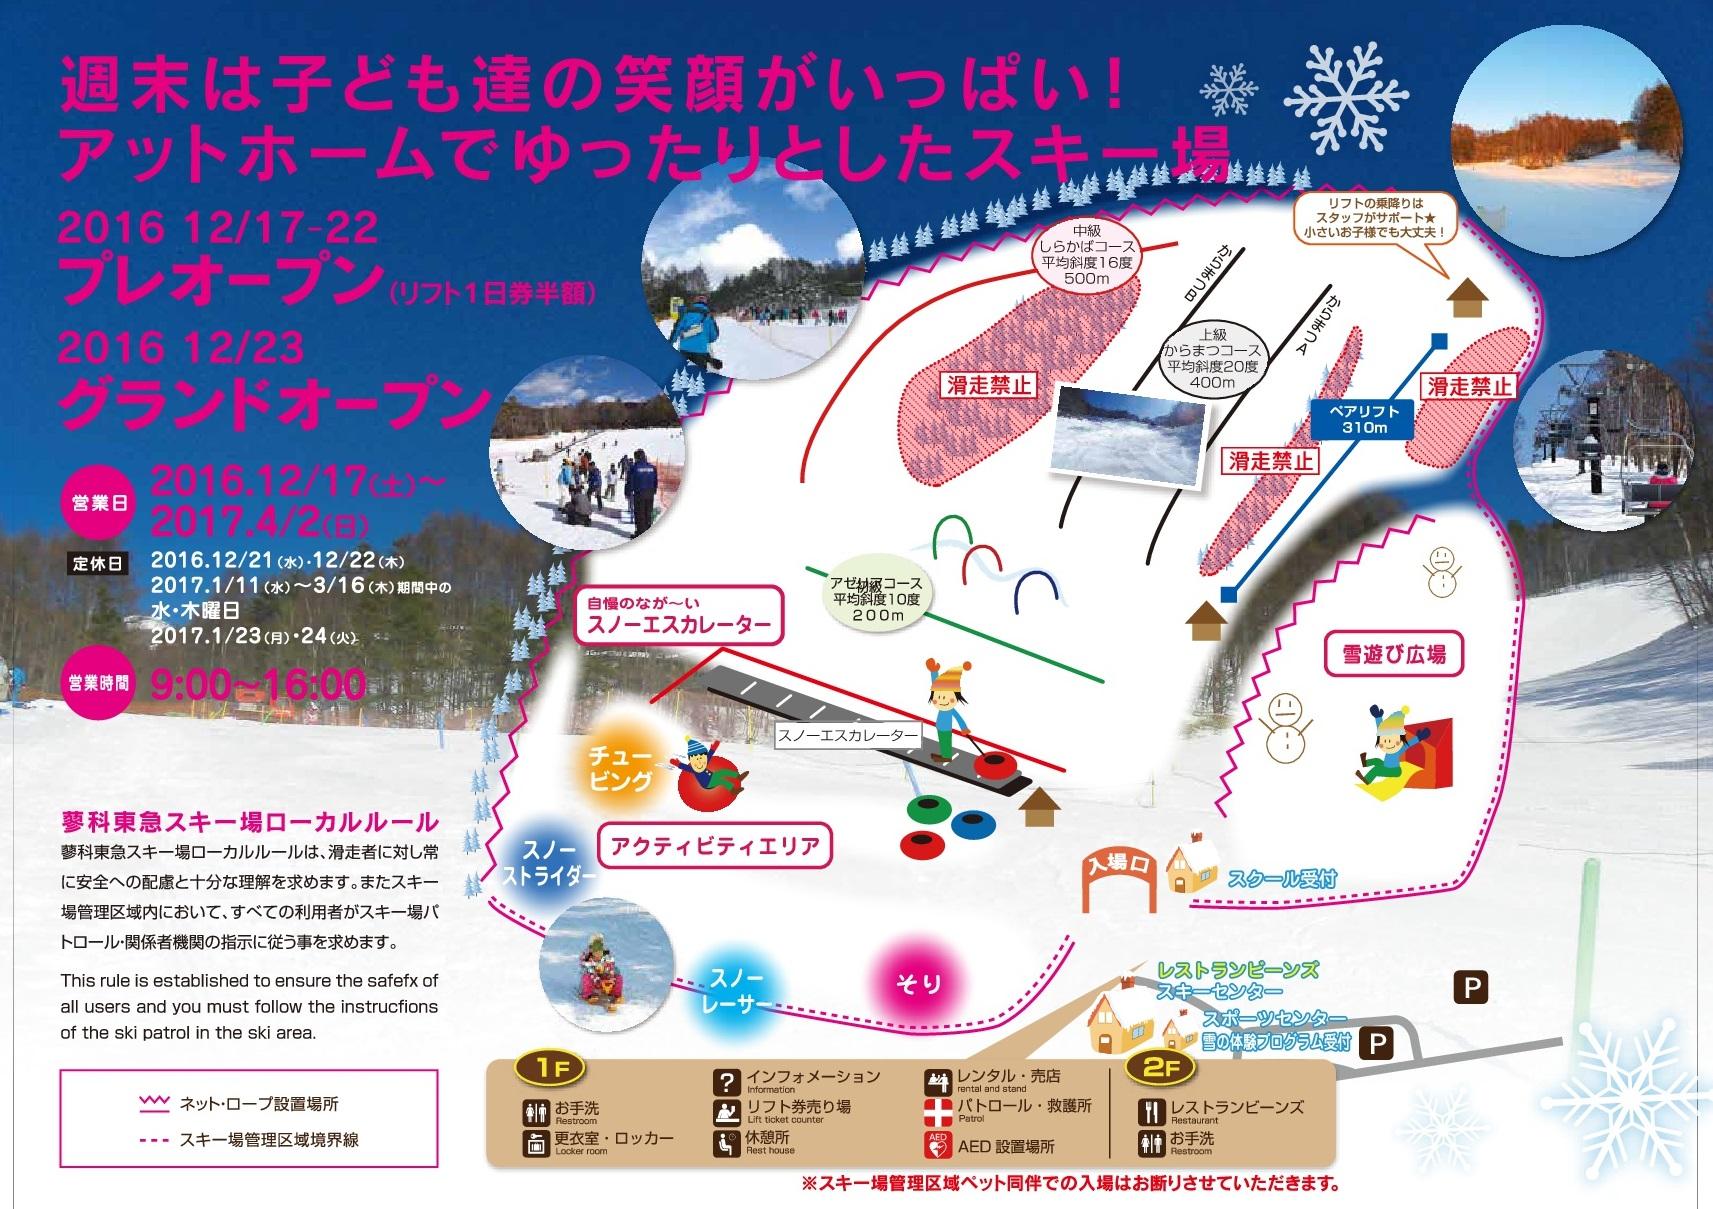 Tateshina Tokyu Ski Resort